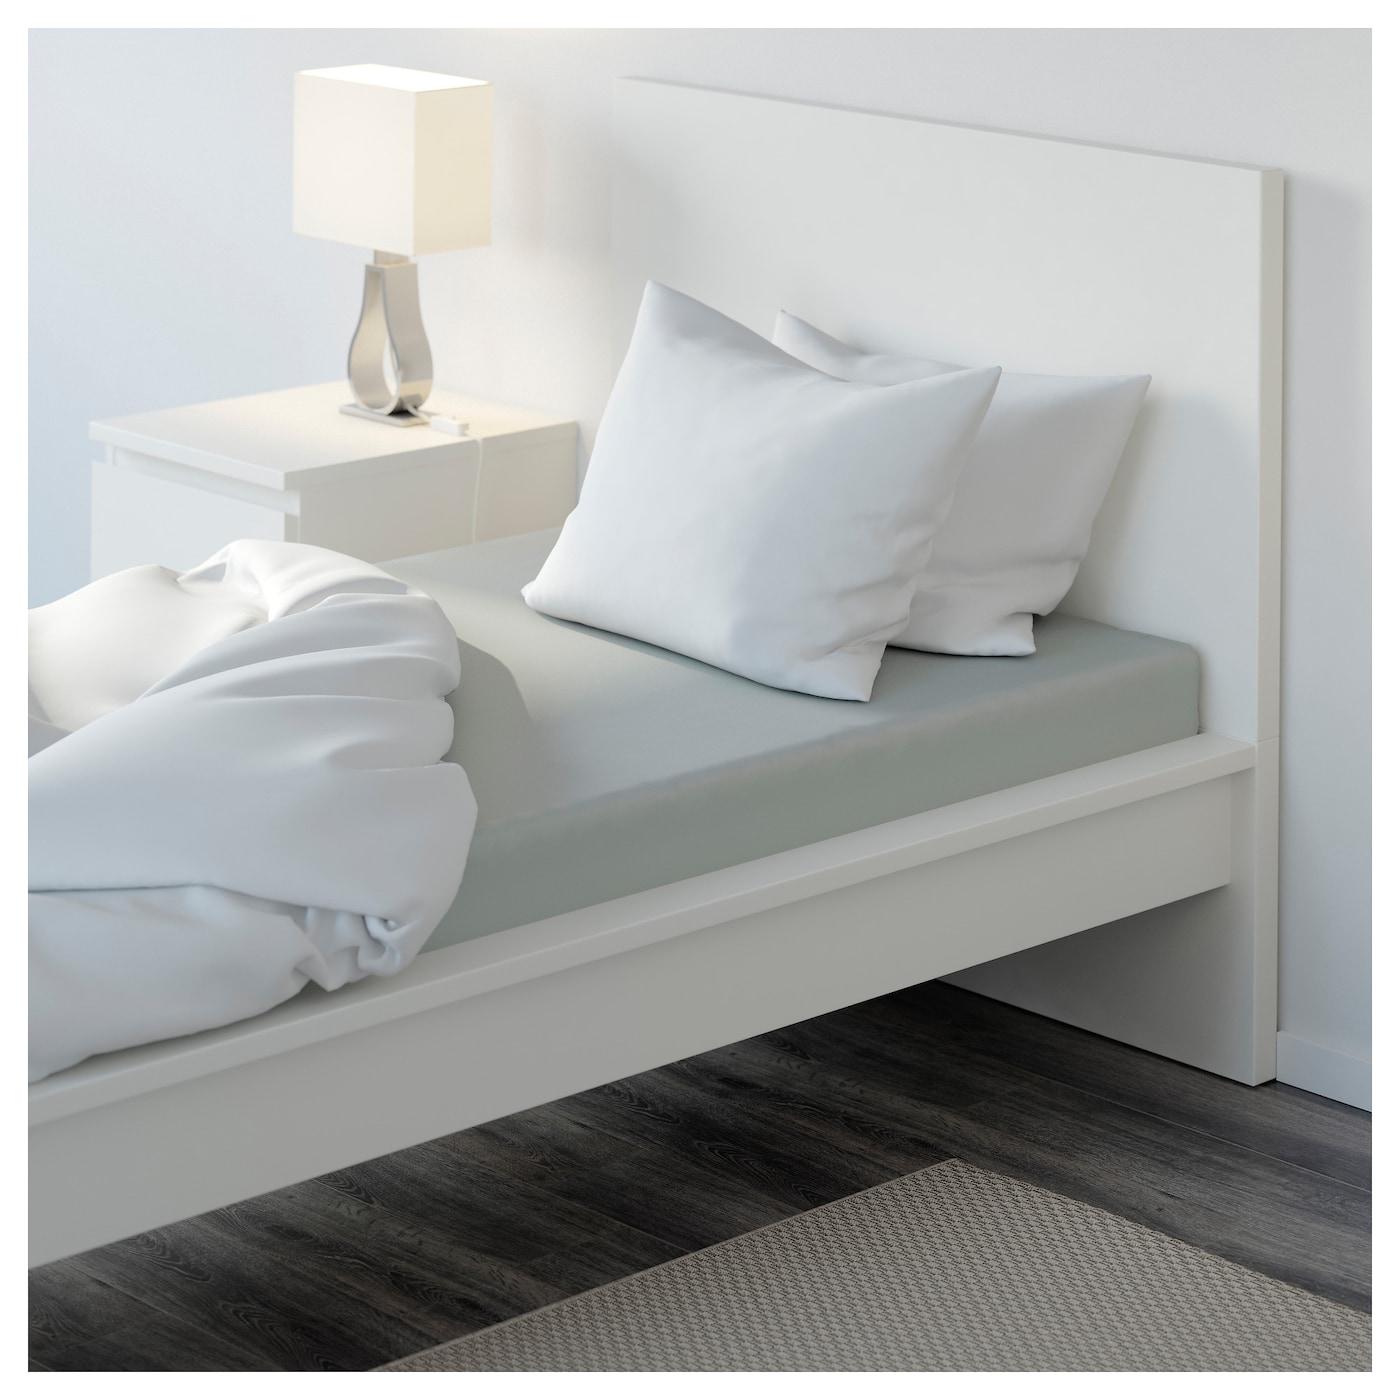 nattjasmin drap housse gris clair 90 x 200 cm ikea. Black Bedroom Furniture Sets. Home Design Ideas